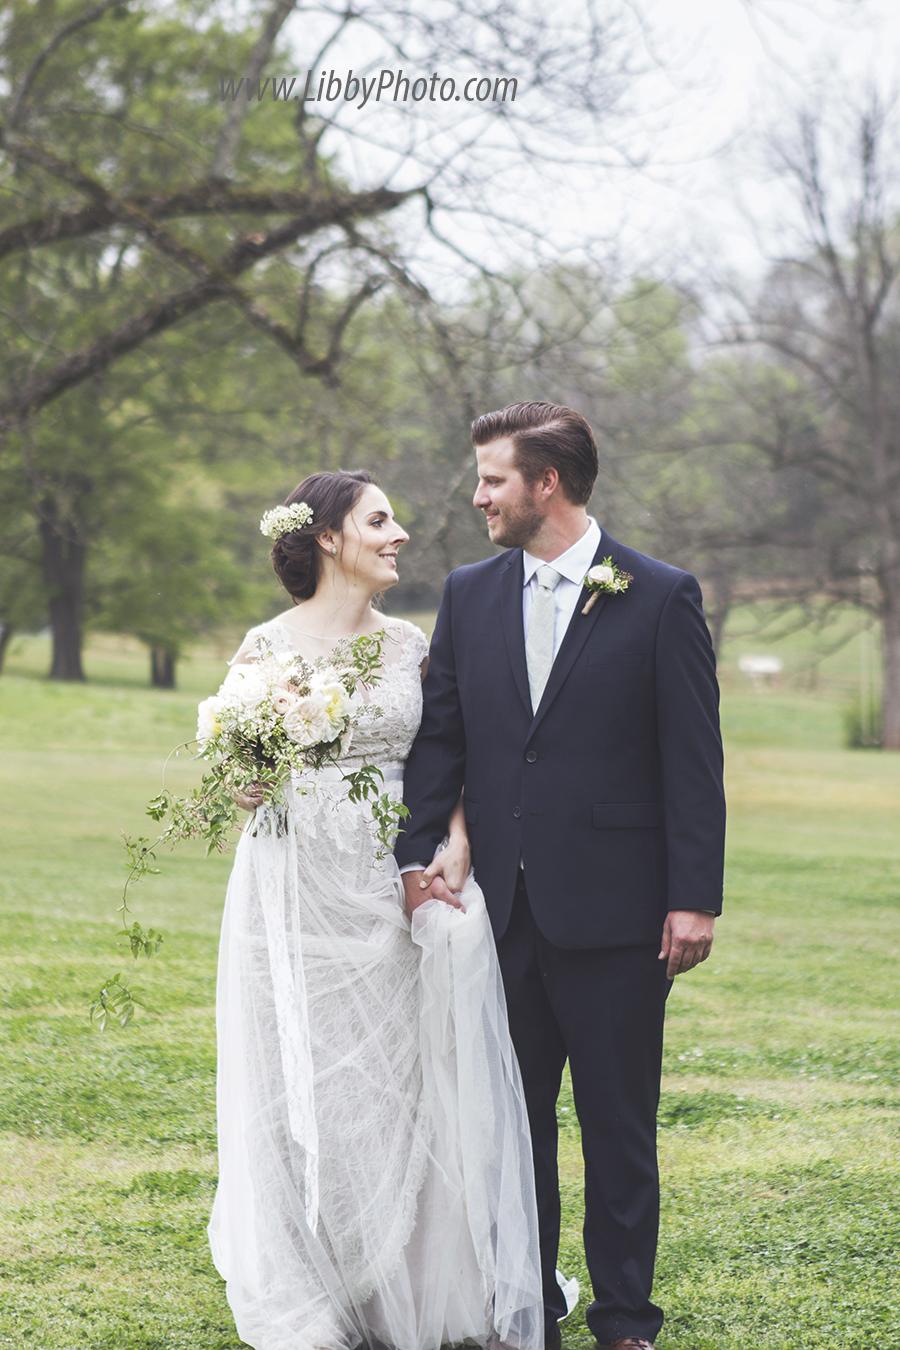 Atlanta wedding photography Libbyphoto (10).jpg